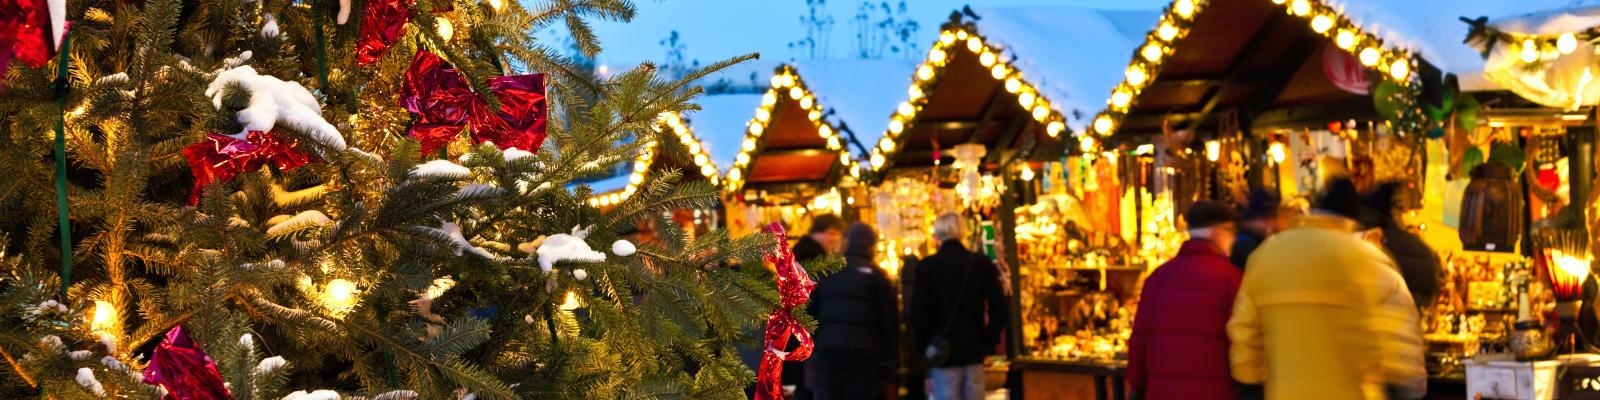 Christmas tree and people browsing the christmas market